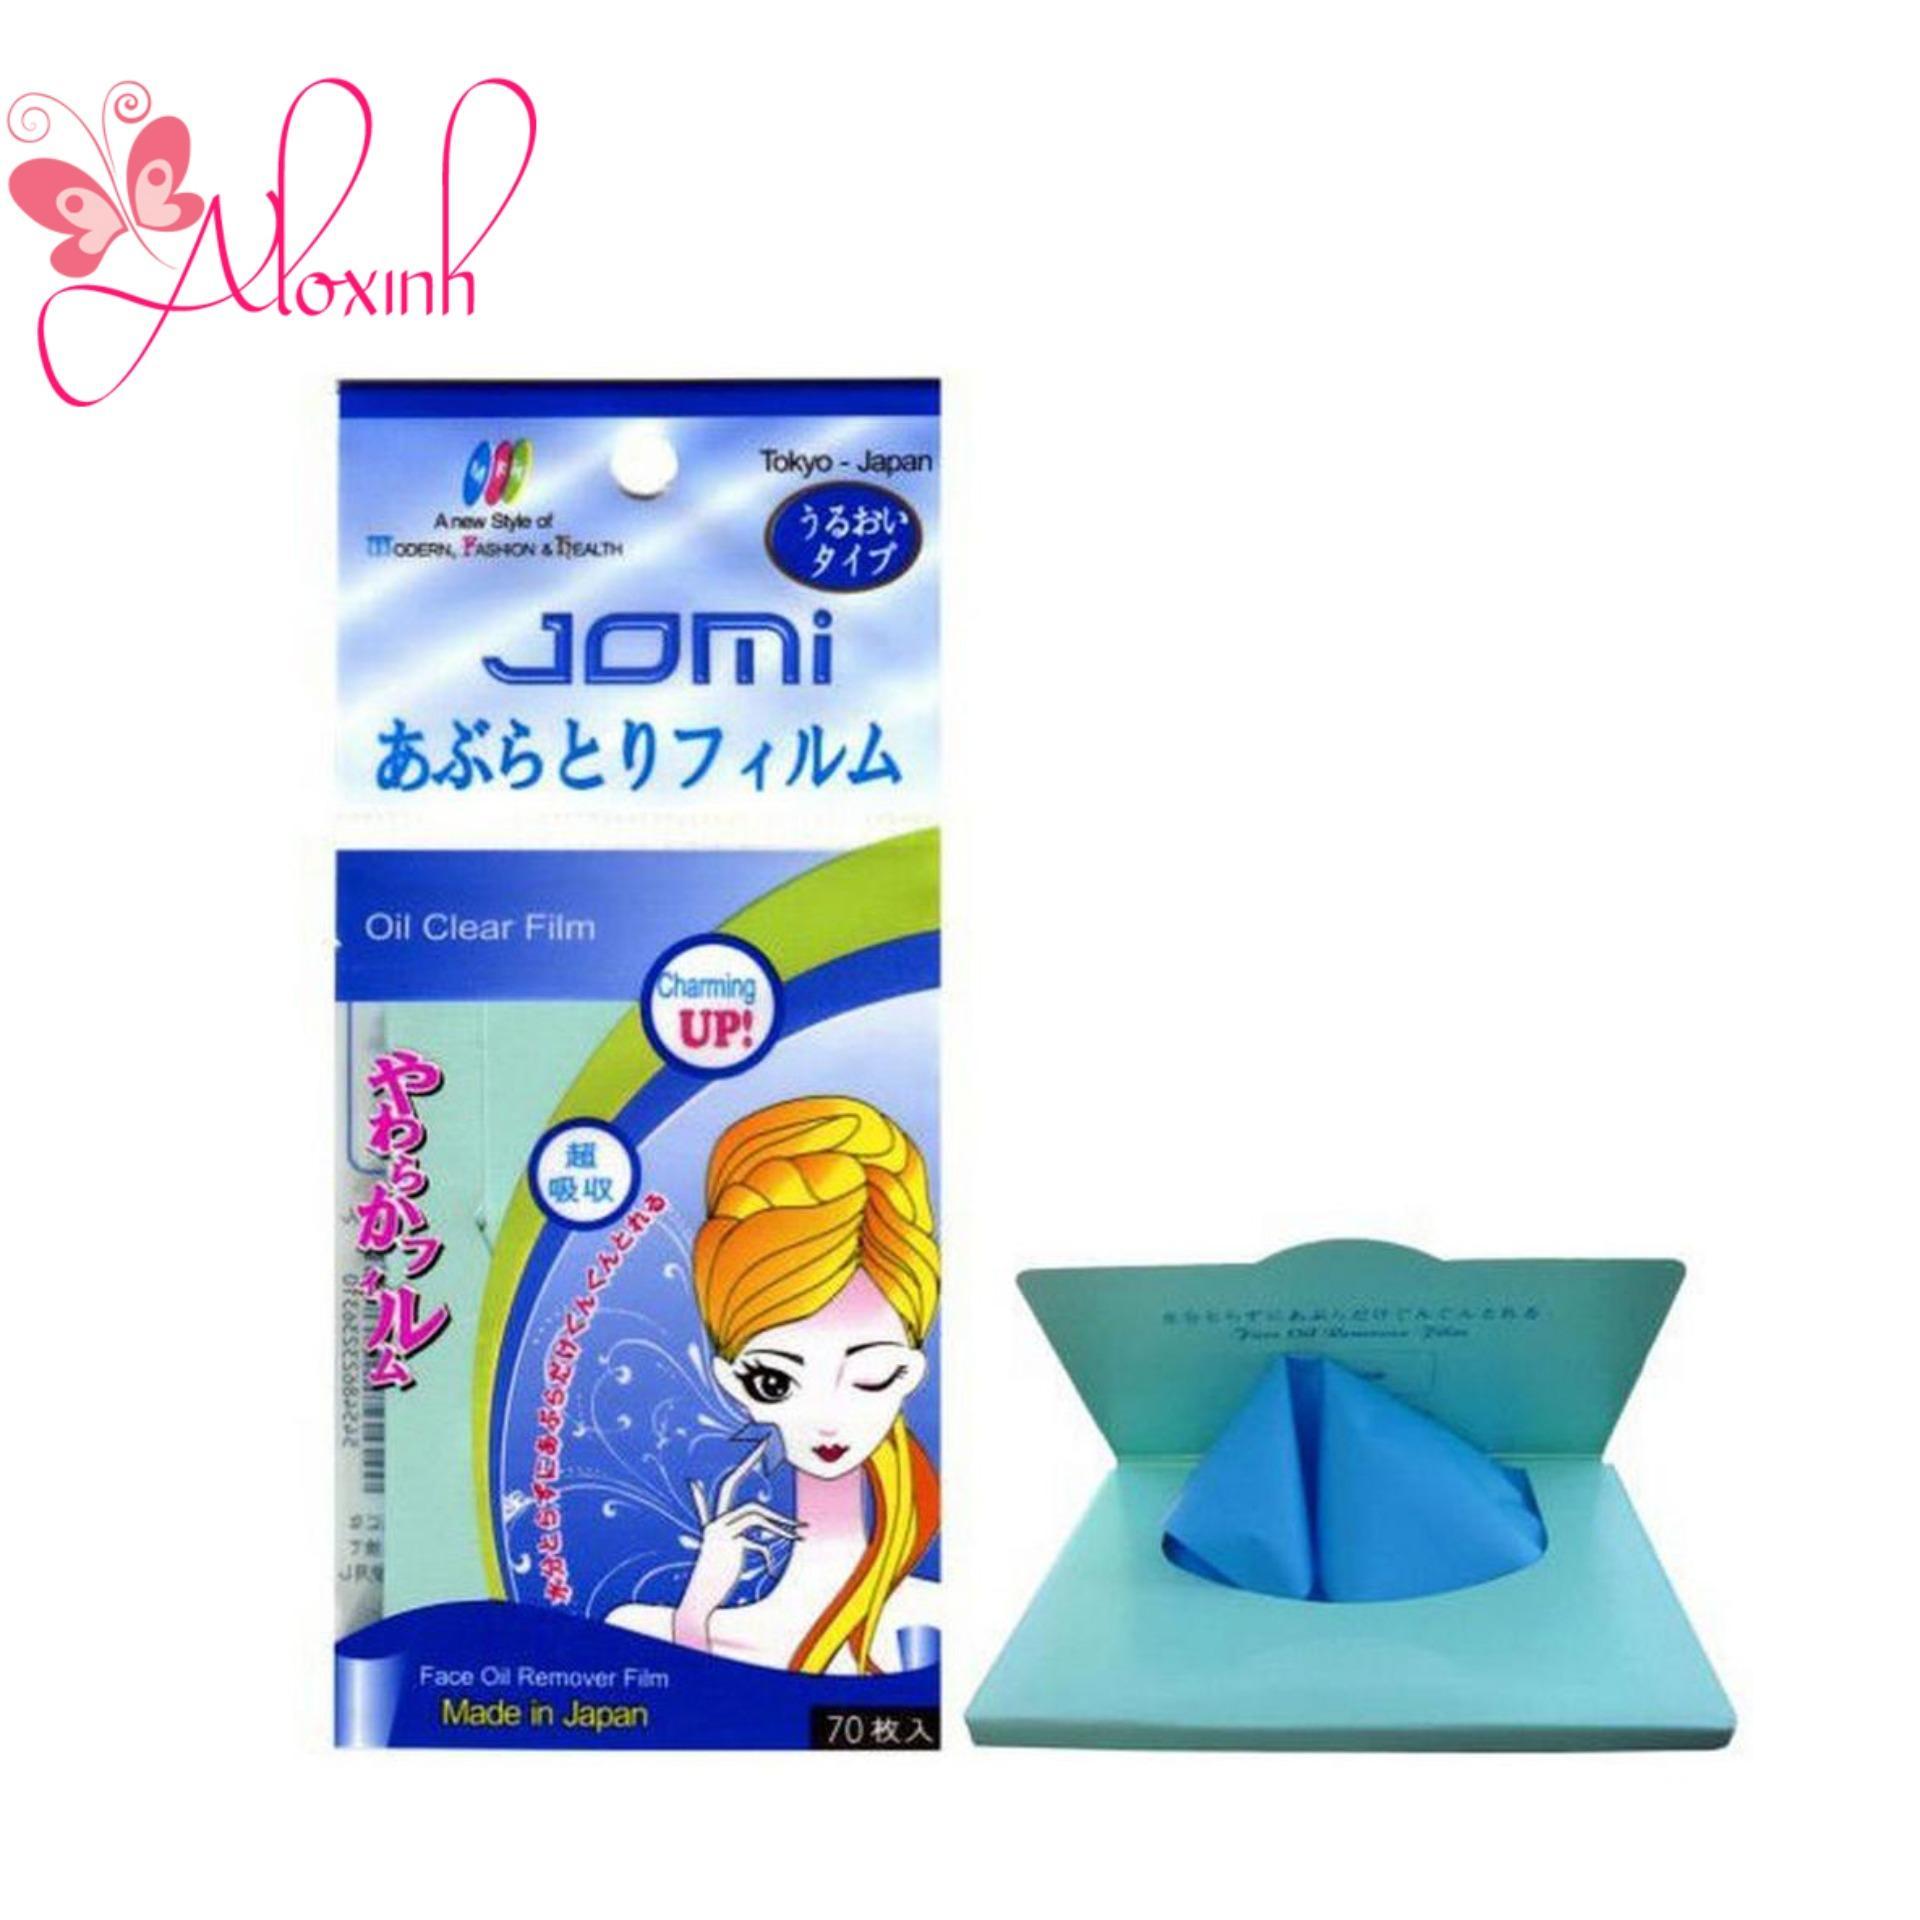 Giấy thấm dầu Jomi Nhật Bản – Aloxinh88